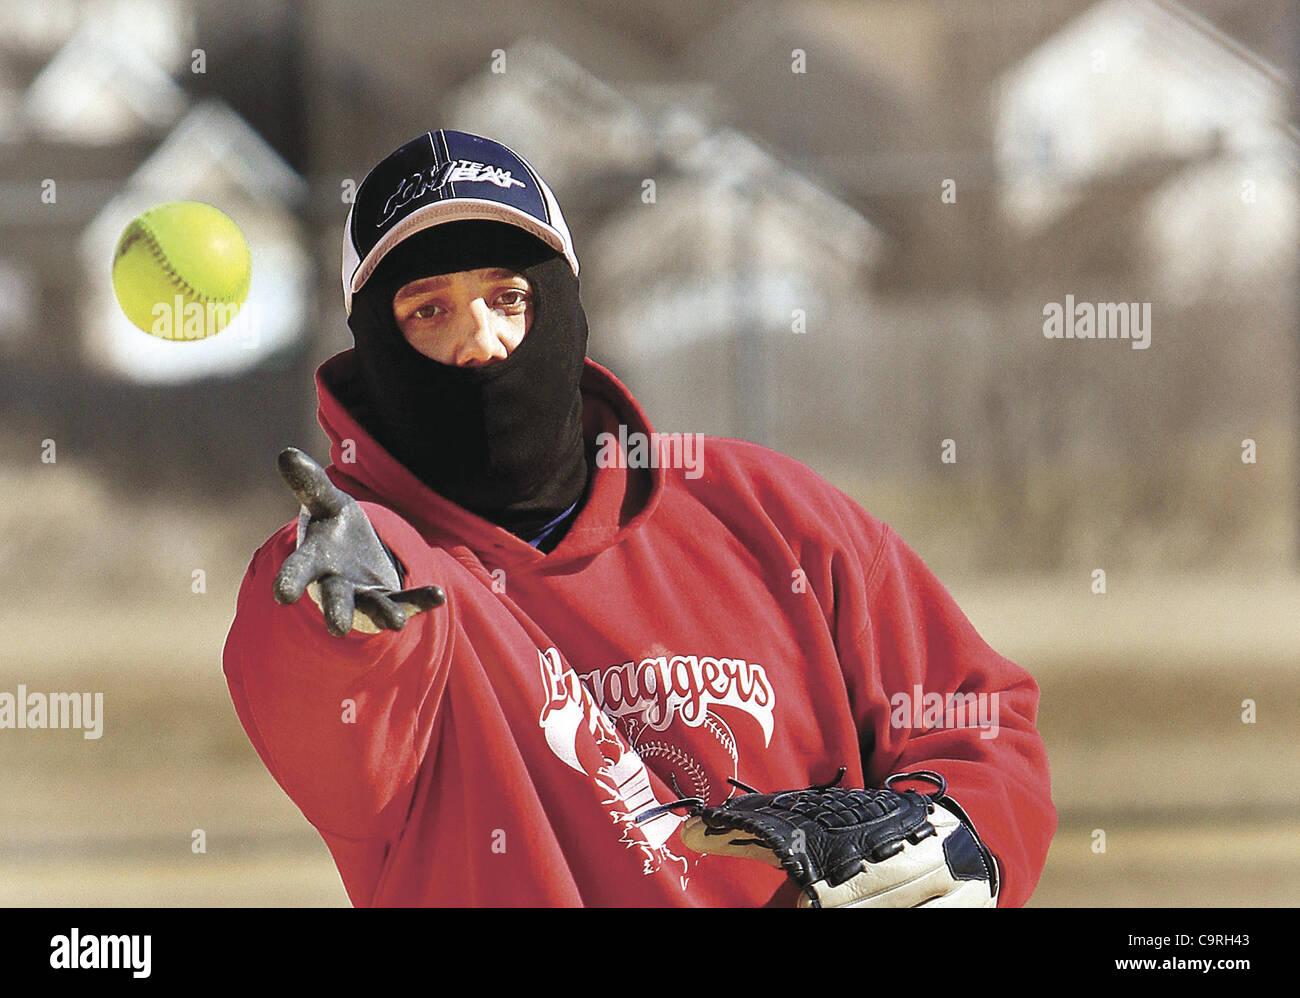 Feb. 12, 2012 - Iowa, U.S. - Adam Jackson of Rock Island, Ill., pitches Sunday, Feb. 12, 2012, during the 36th annual - Stock Image